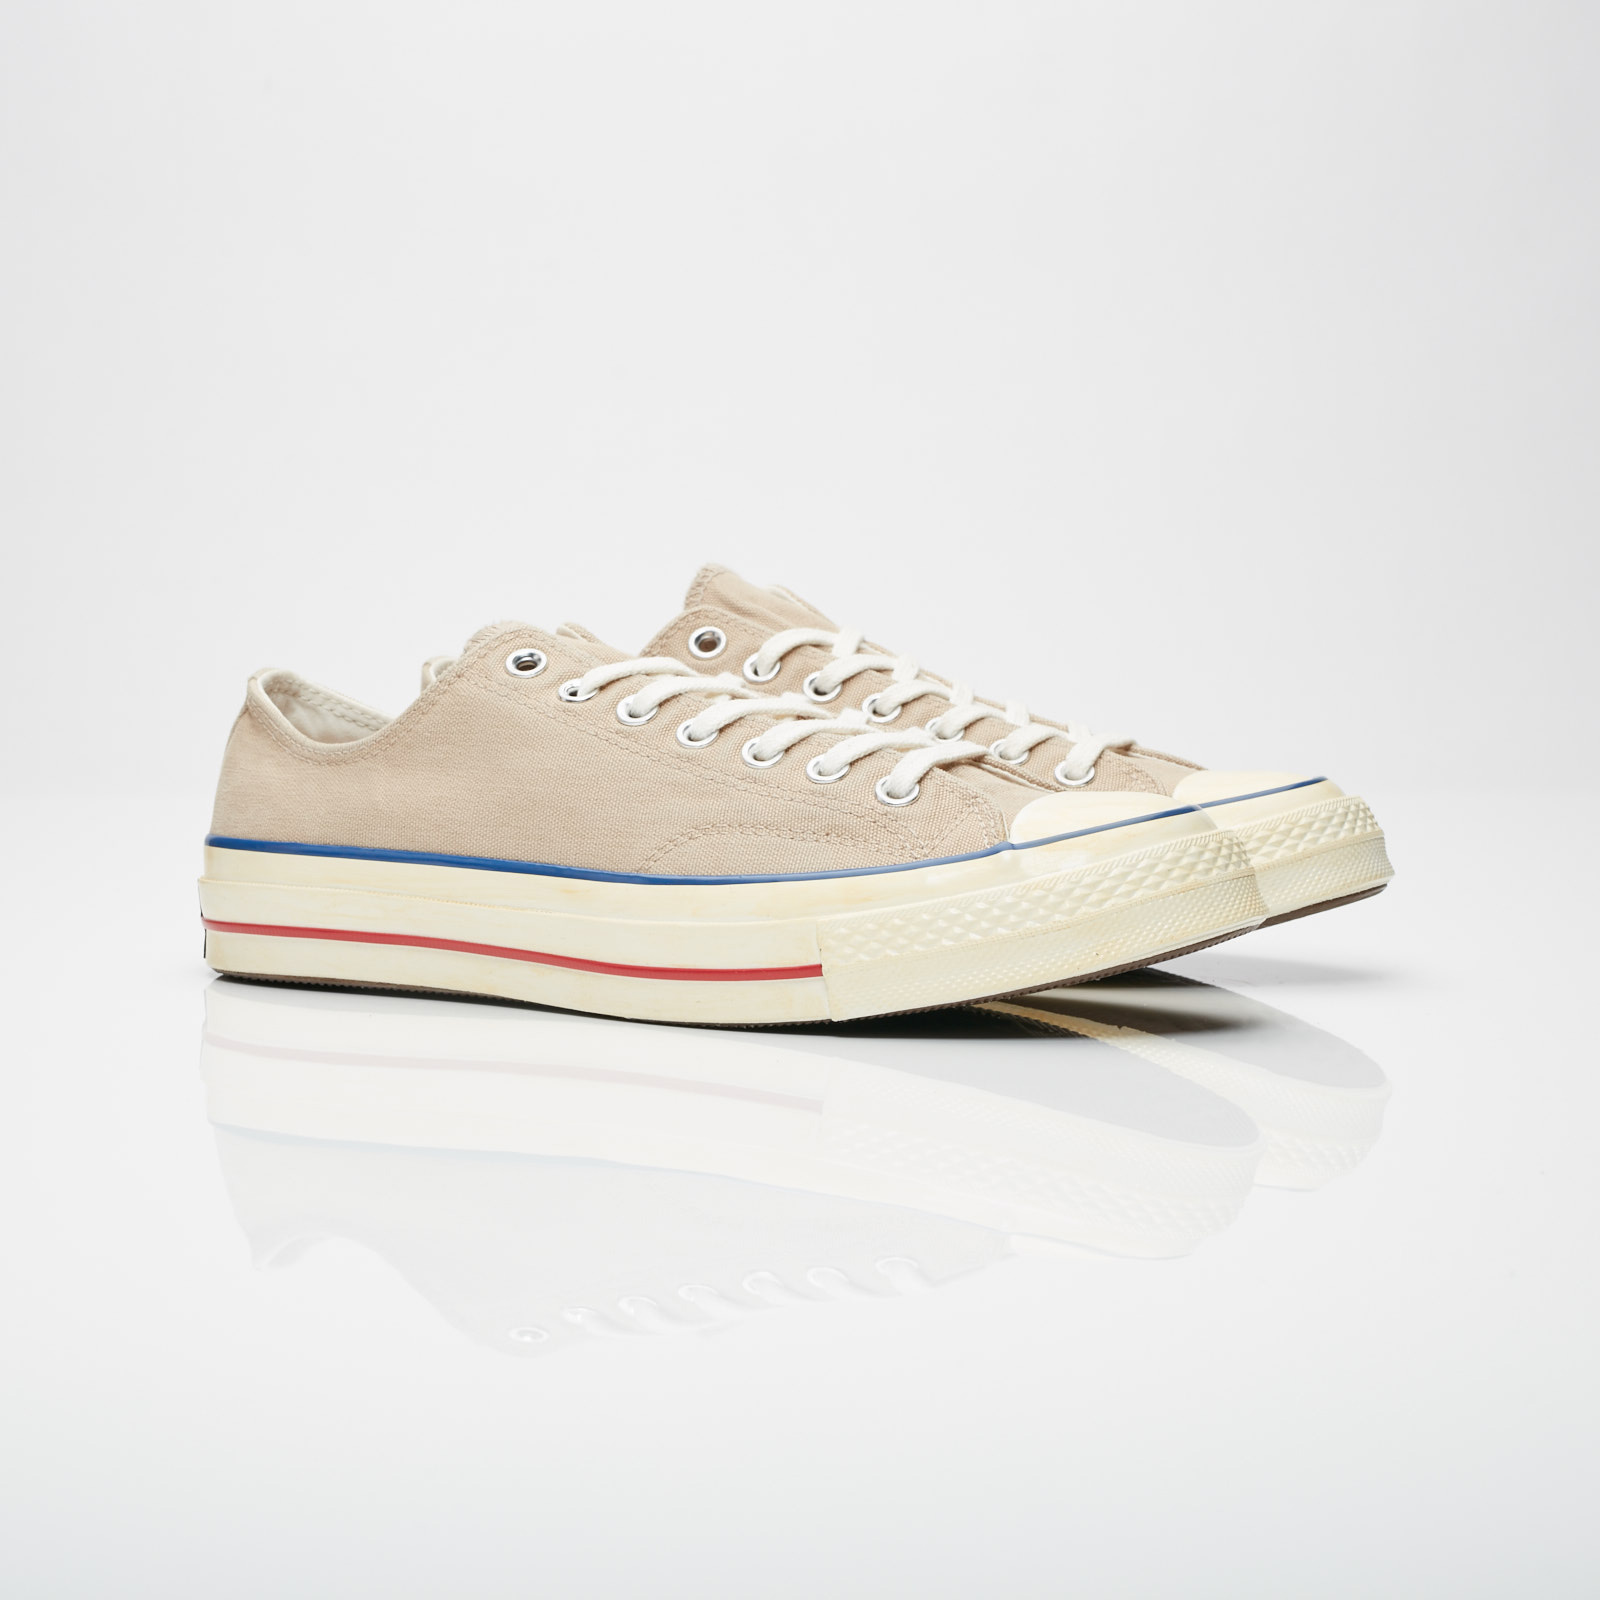 c3e150f1b34 Converse Chuck Taylor 70 Ox - 159568c - Sneakersnstuff